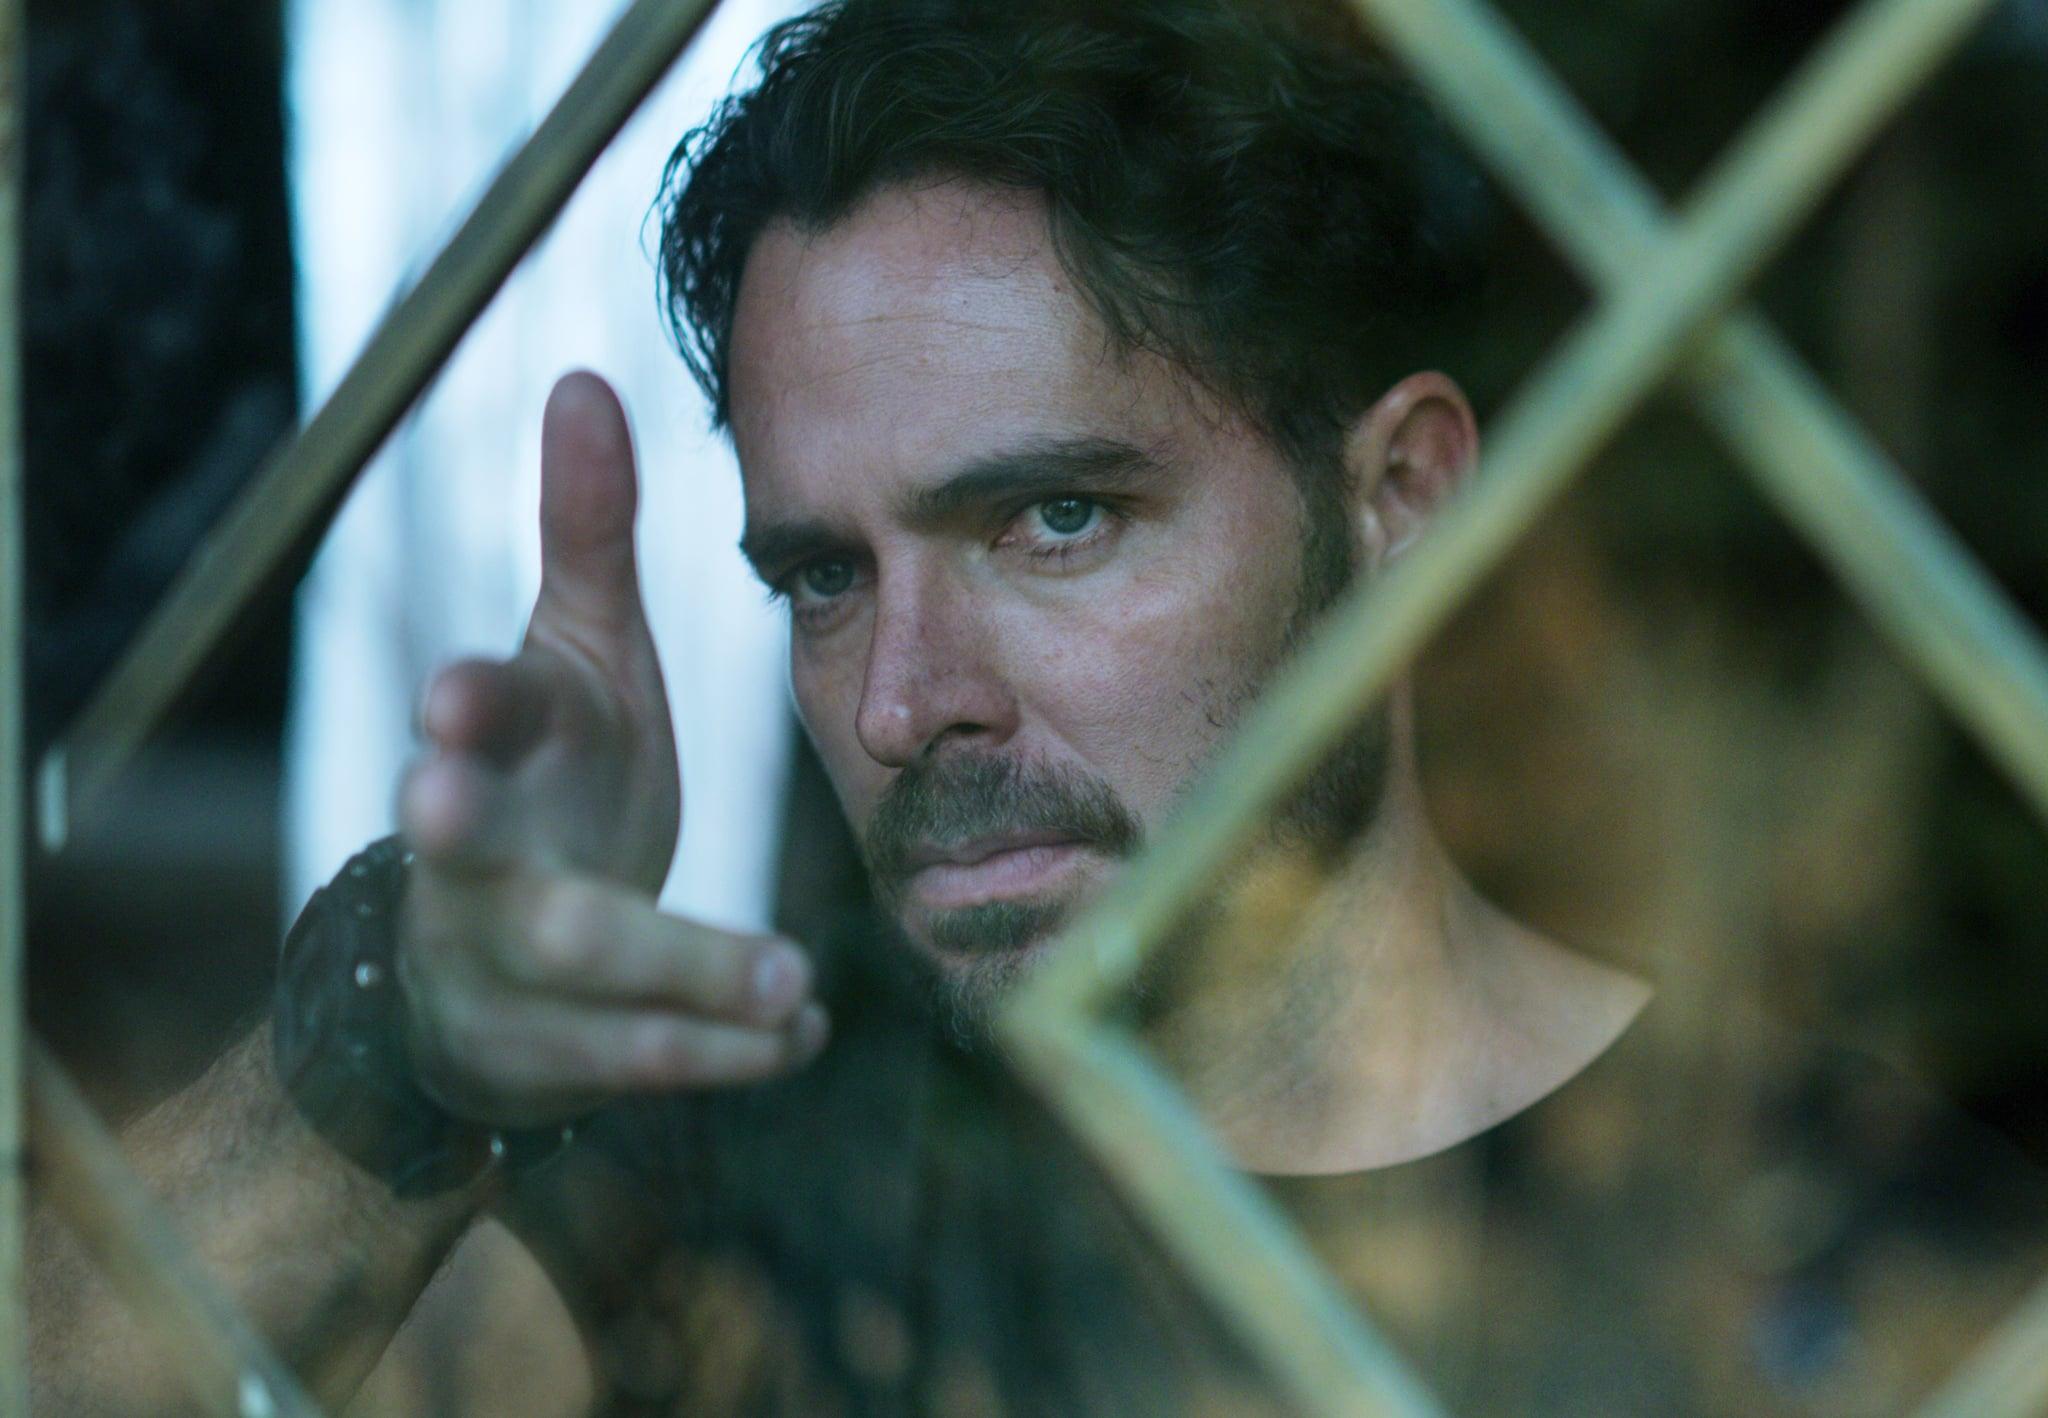 WHO KILLED SARA?, (aka QUIEN MATO A SARA?), Manolo Cardona, 'It Wasn't a Mistake', (Season 1, ep. 101, aired March 25, 2021). photo: Netflix / Courtesy Everett Collection